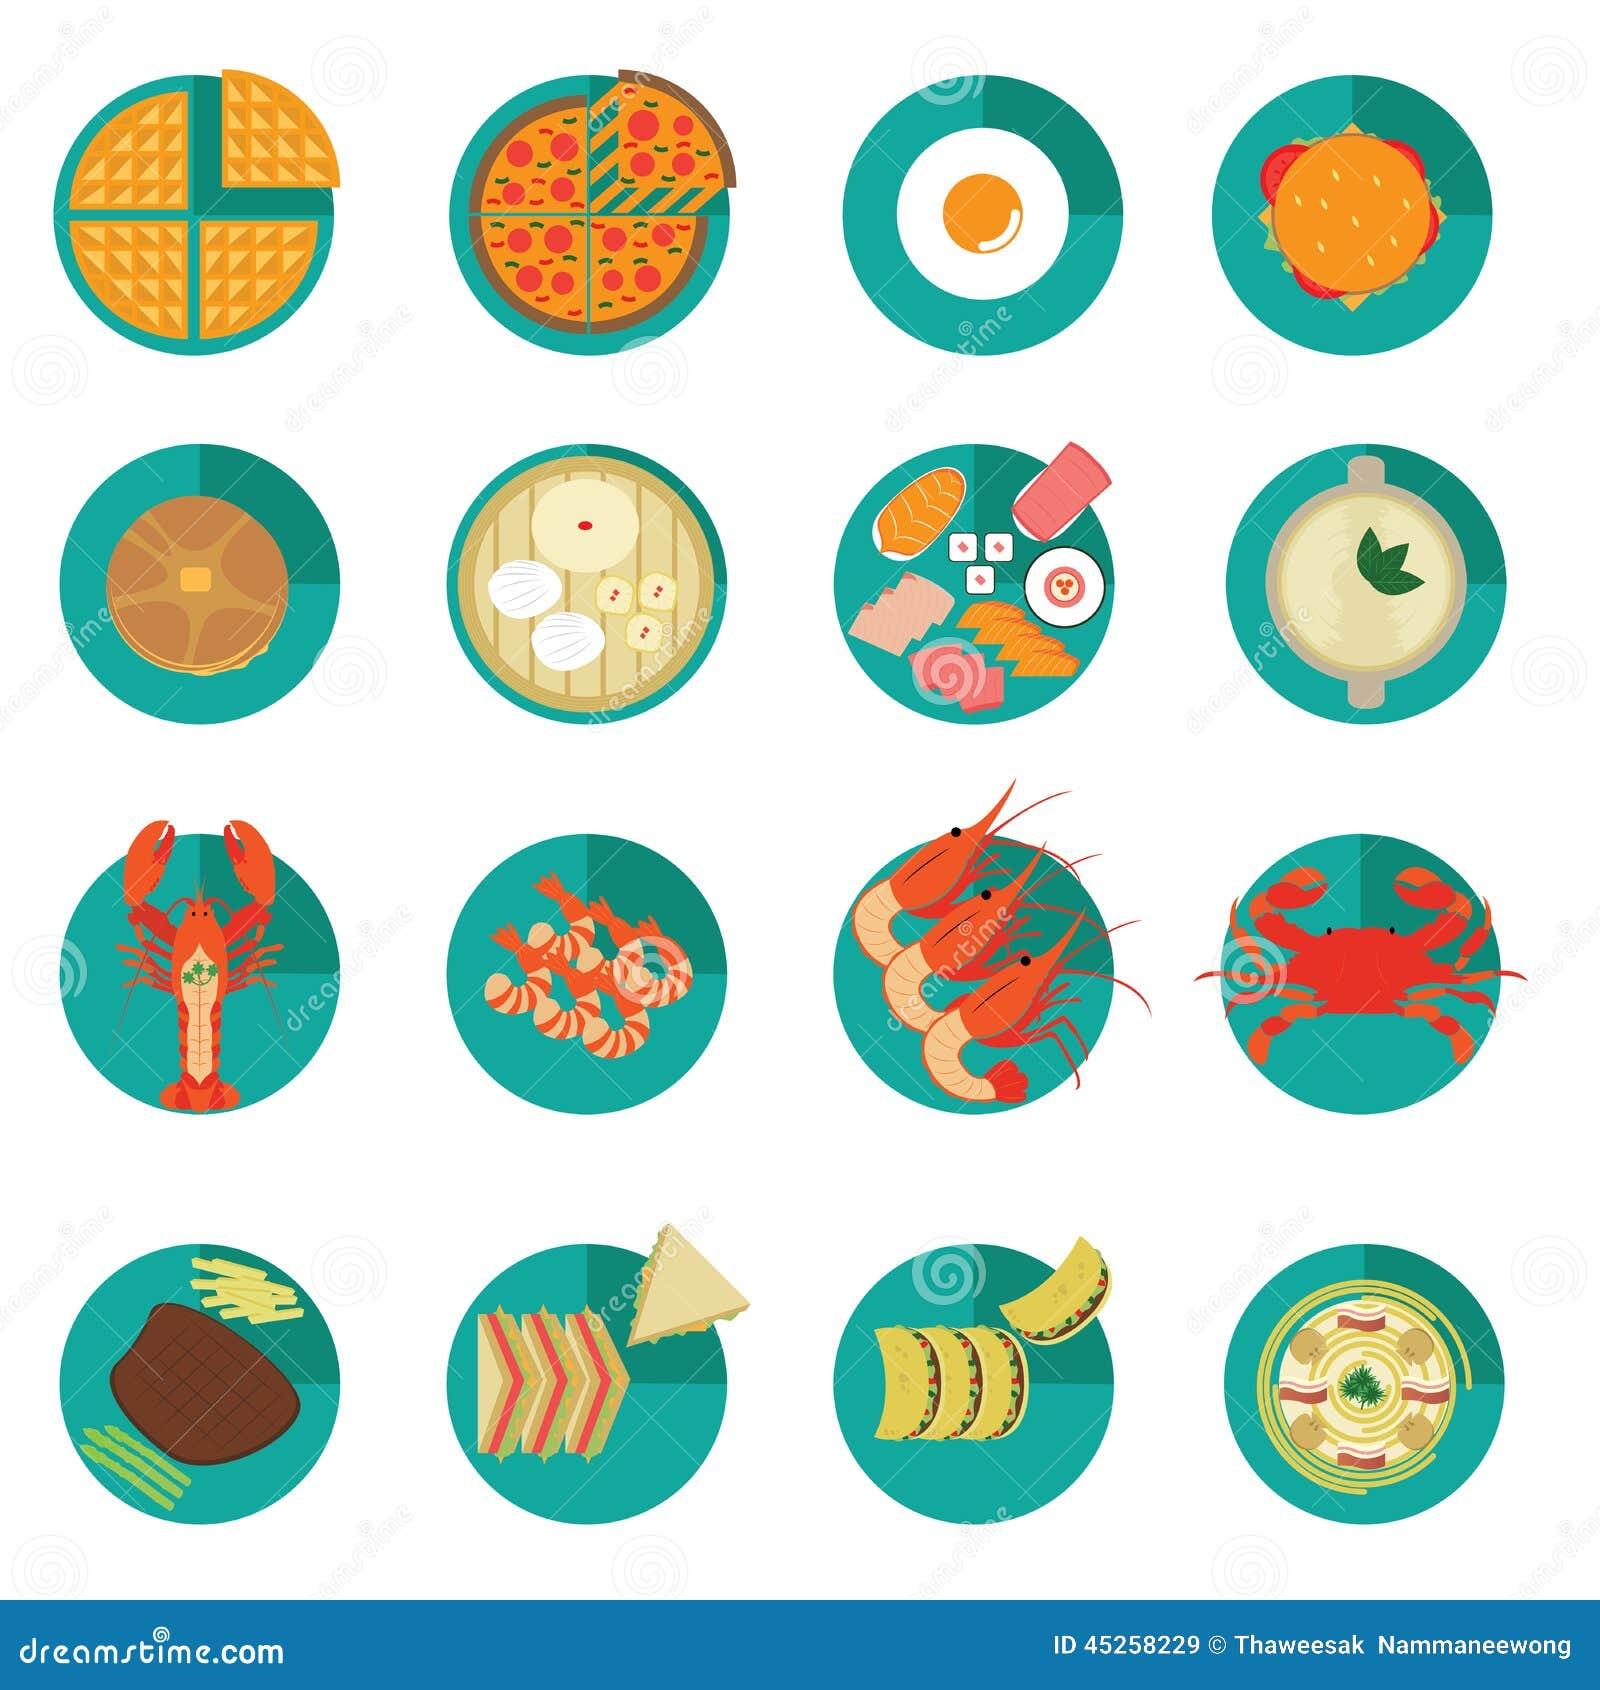 international food Find and save ideas about international food on pinterest | see more ideas about recipes international appetizers, was st patrick irish and best irish nachos recipe.